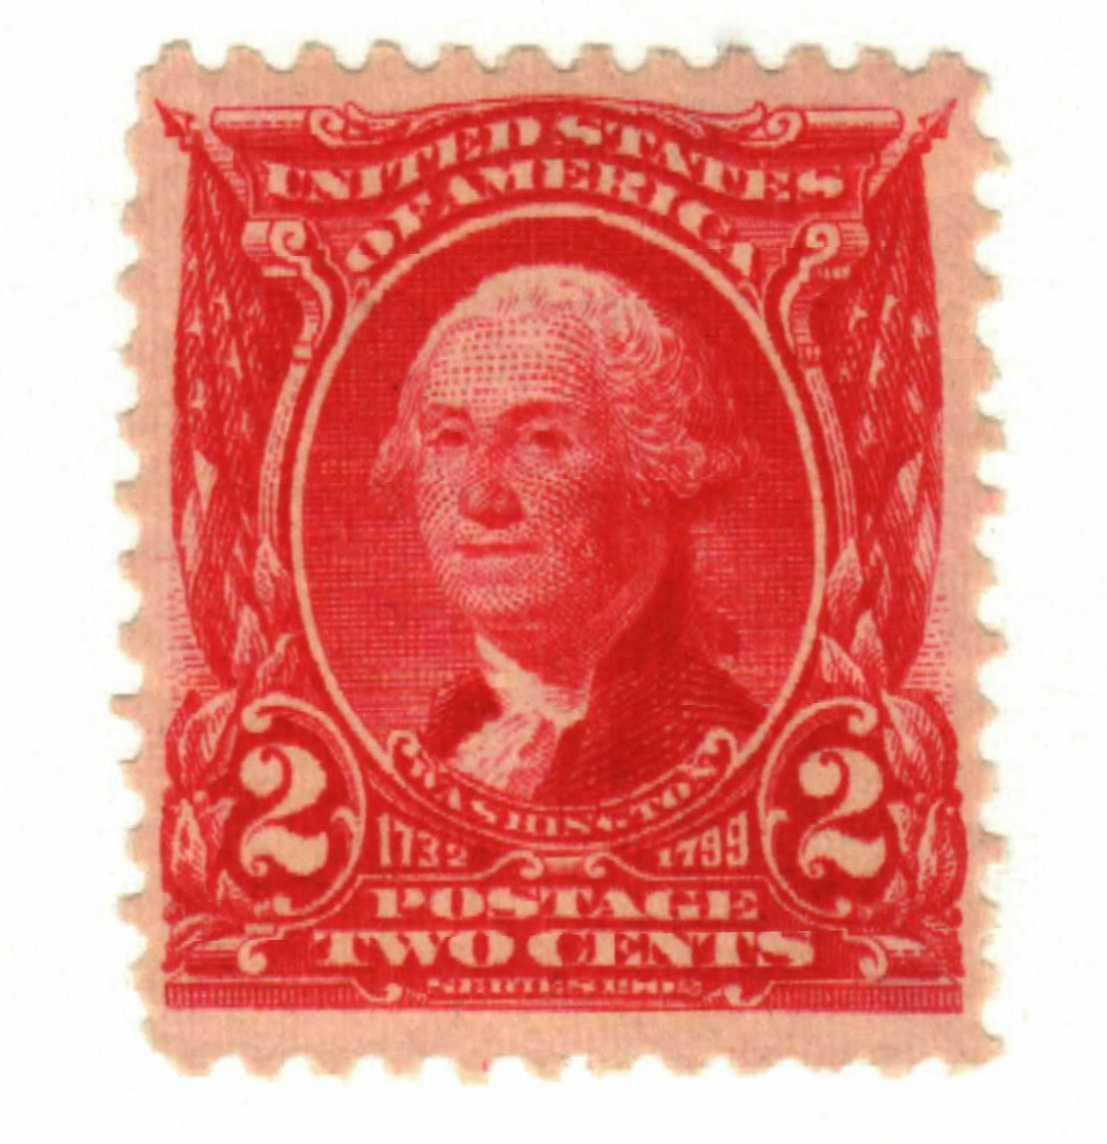 1903 2c Washington, carmine